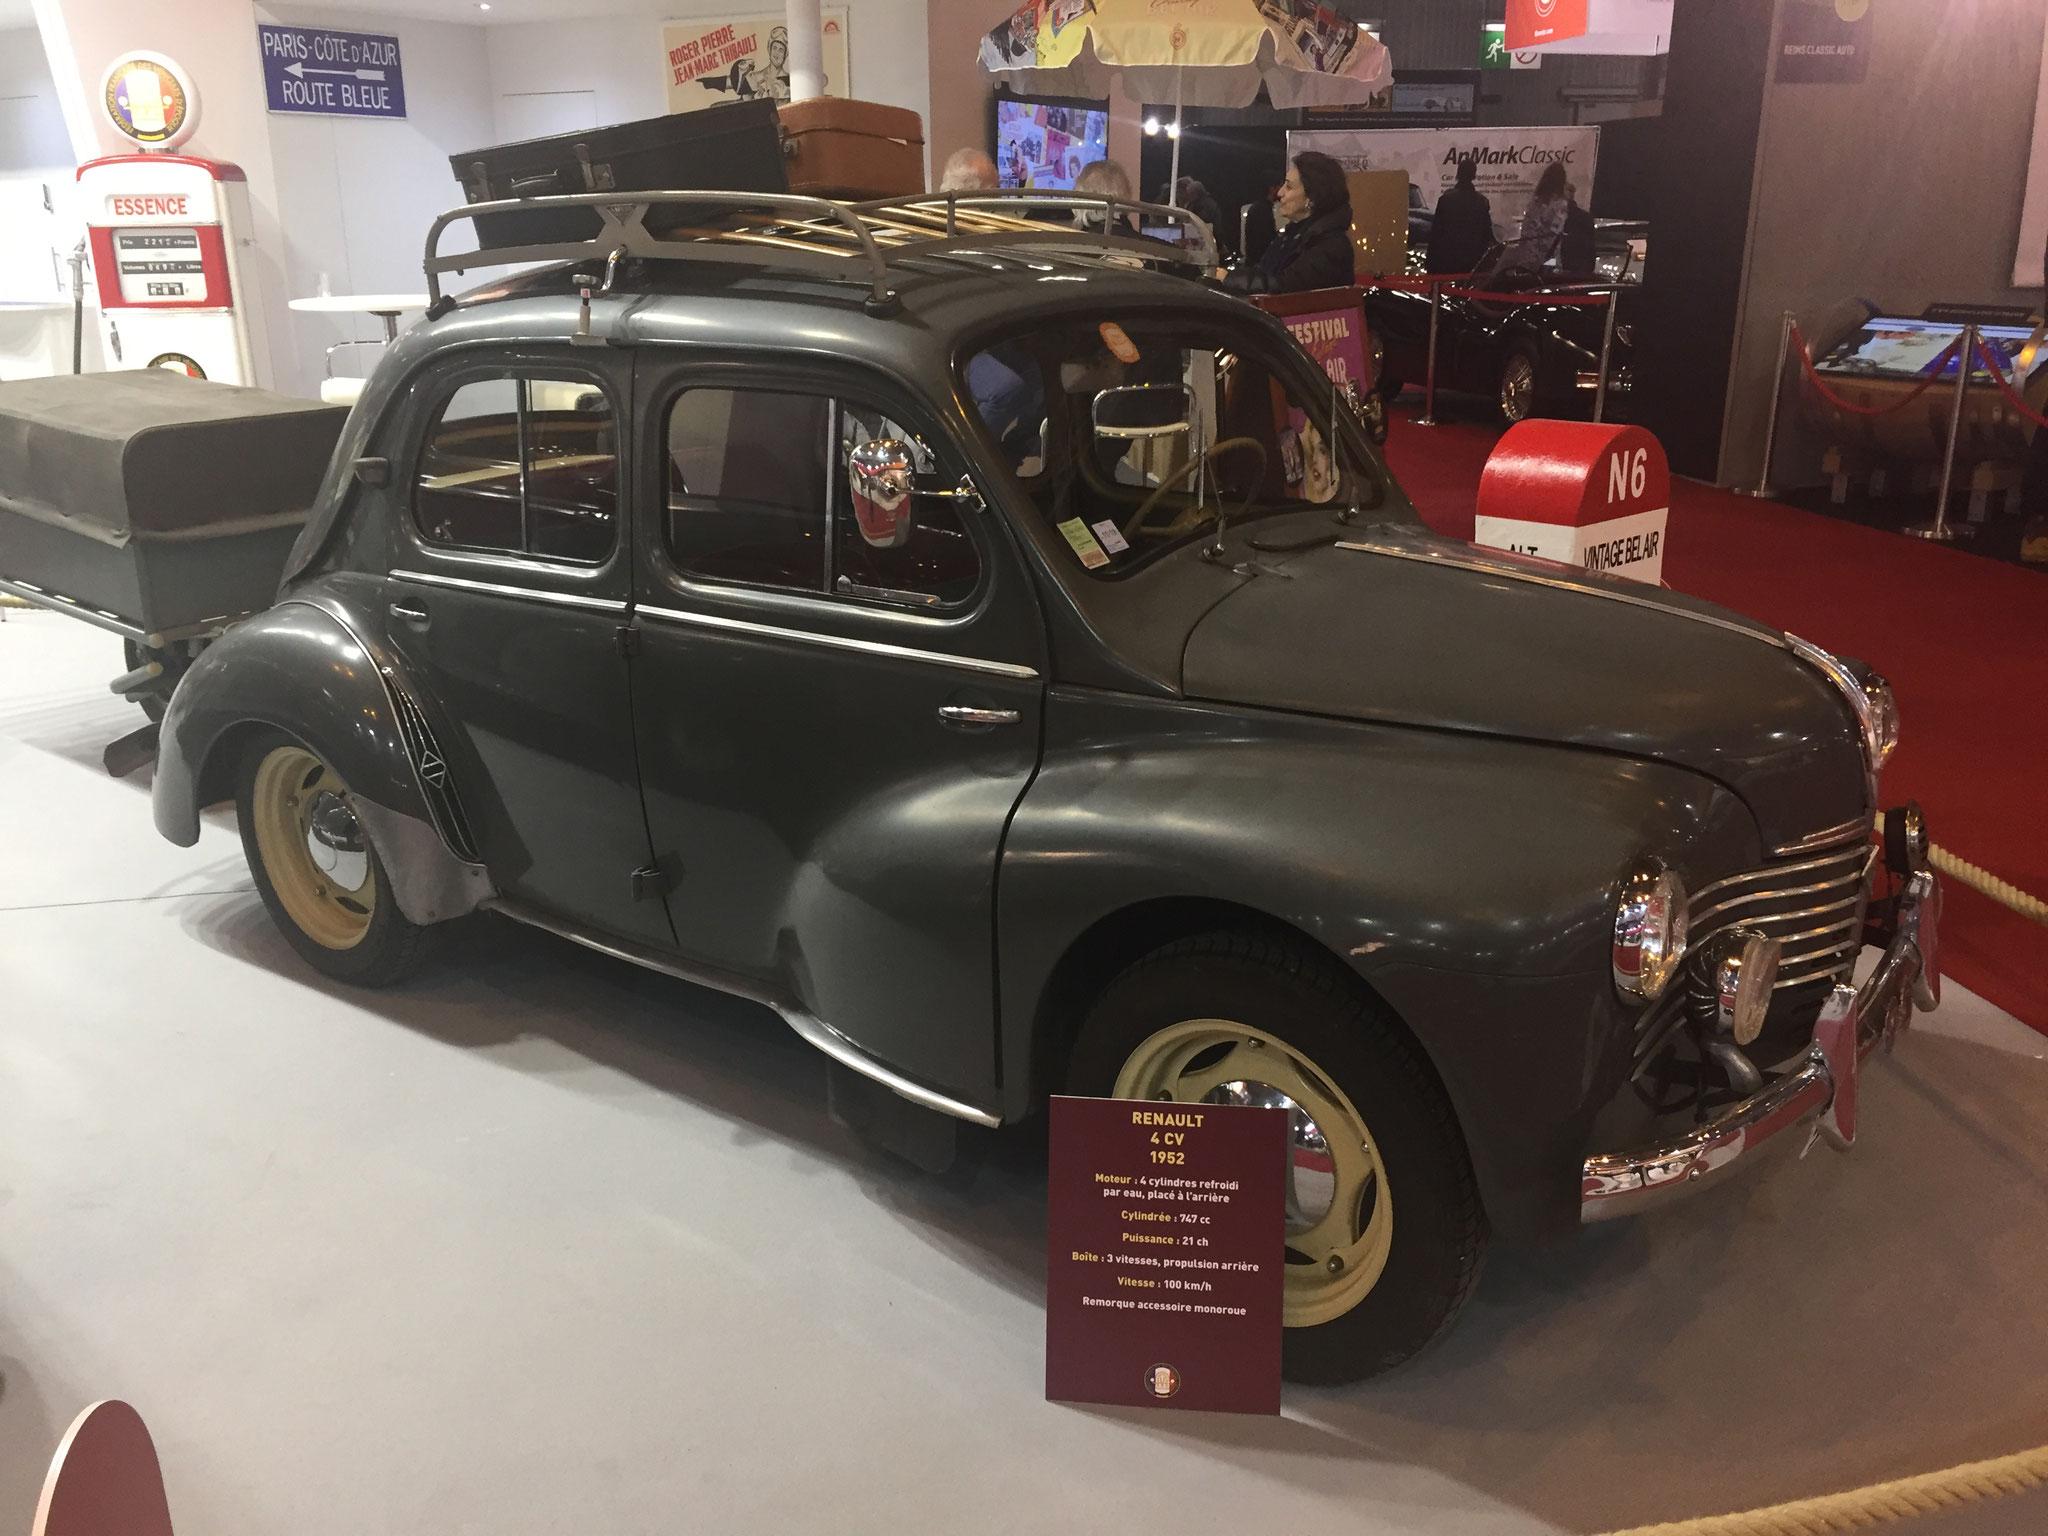 Renault 4 CV (1952)